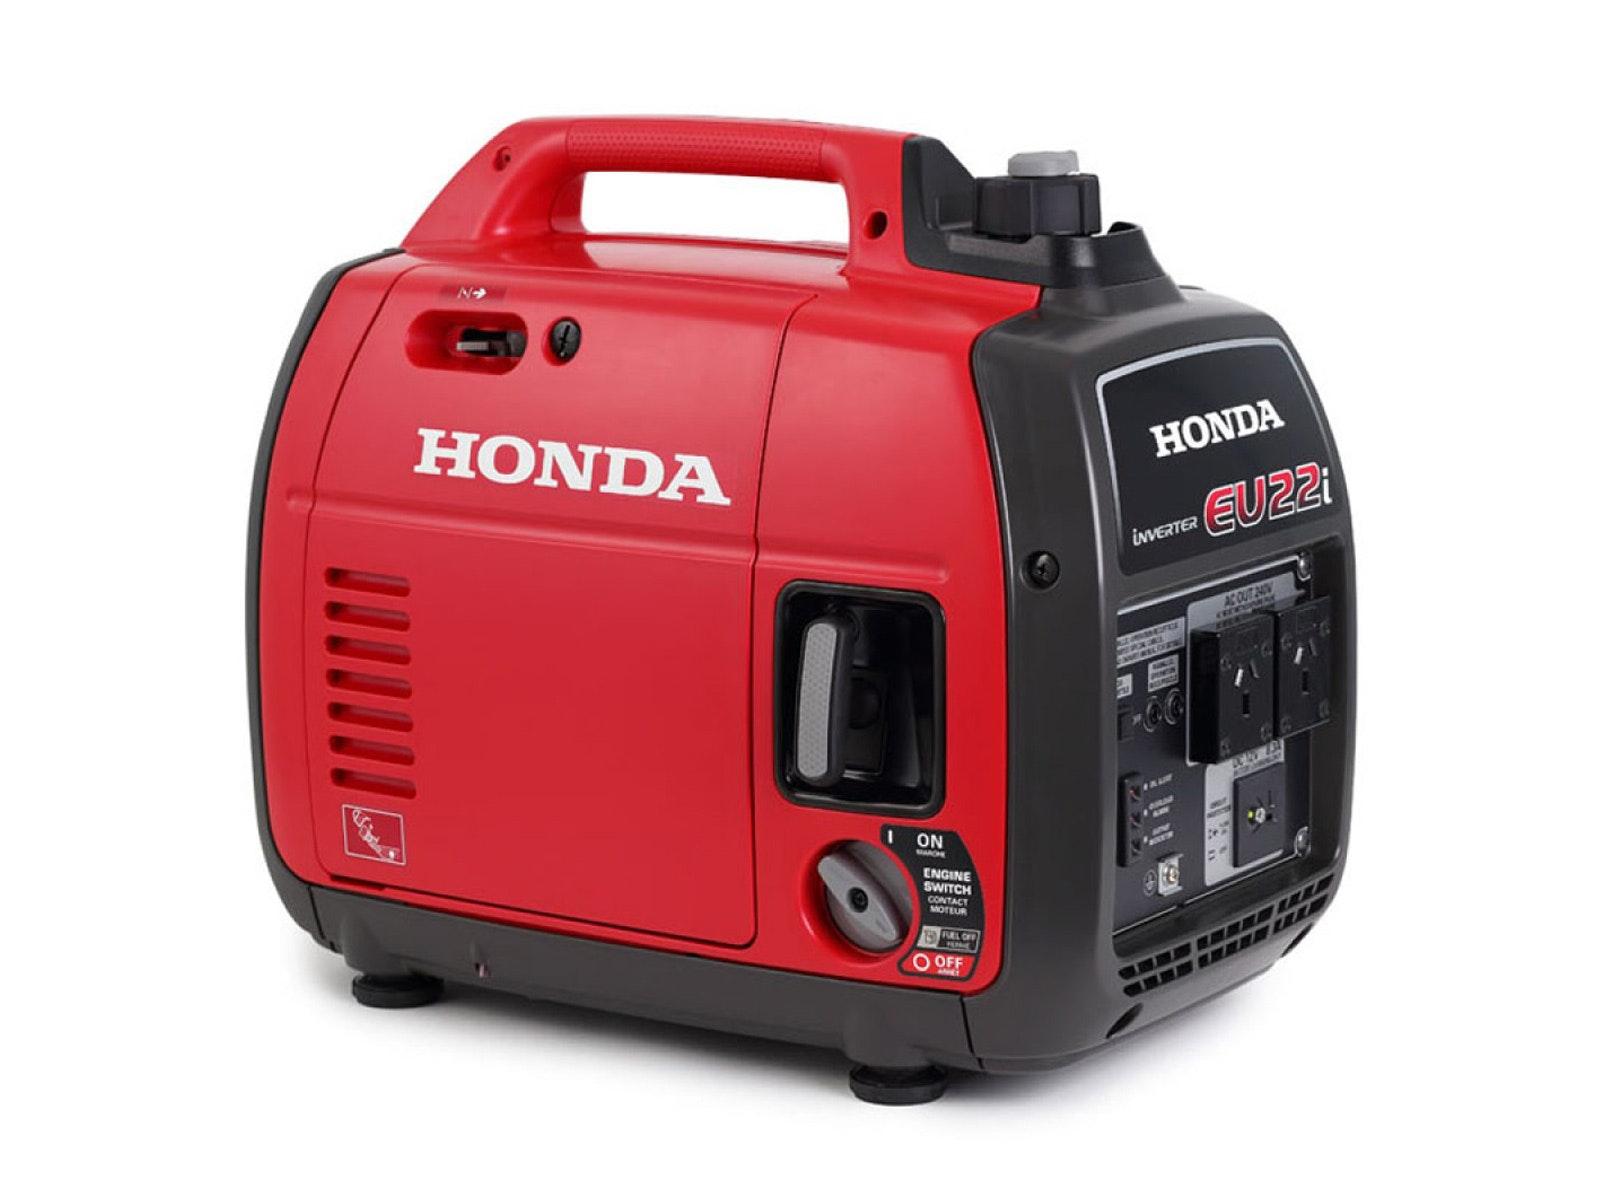 Honda EU22i Inverter Generator 2200W